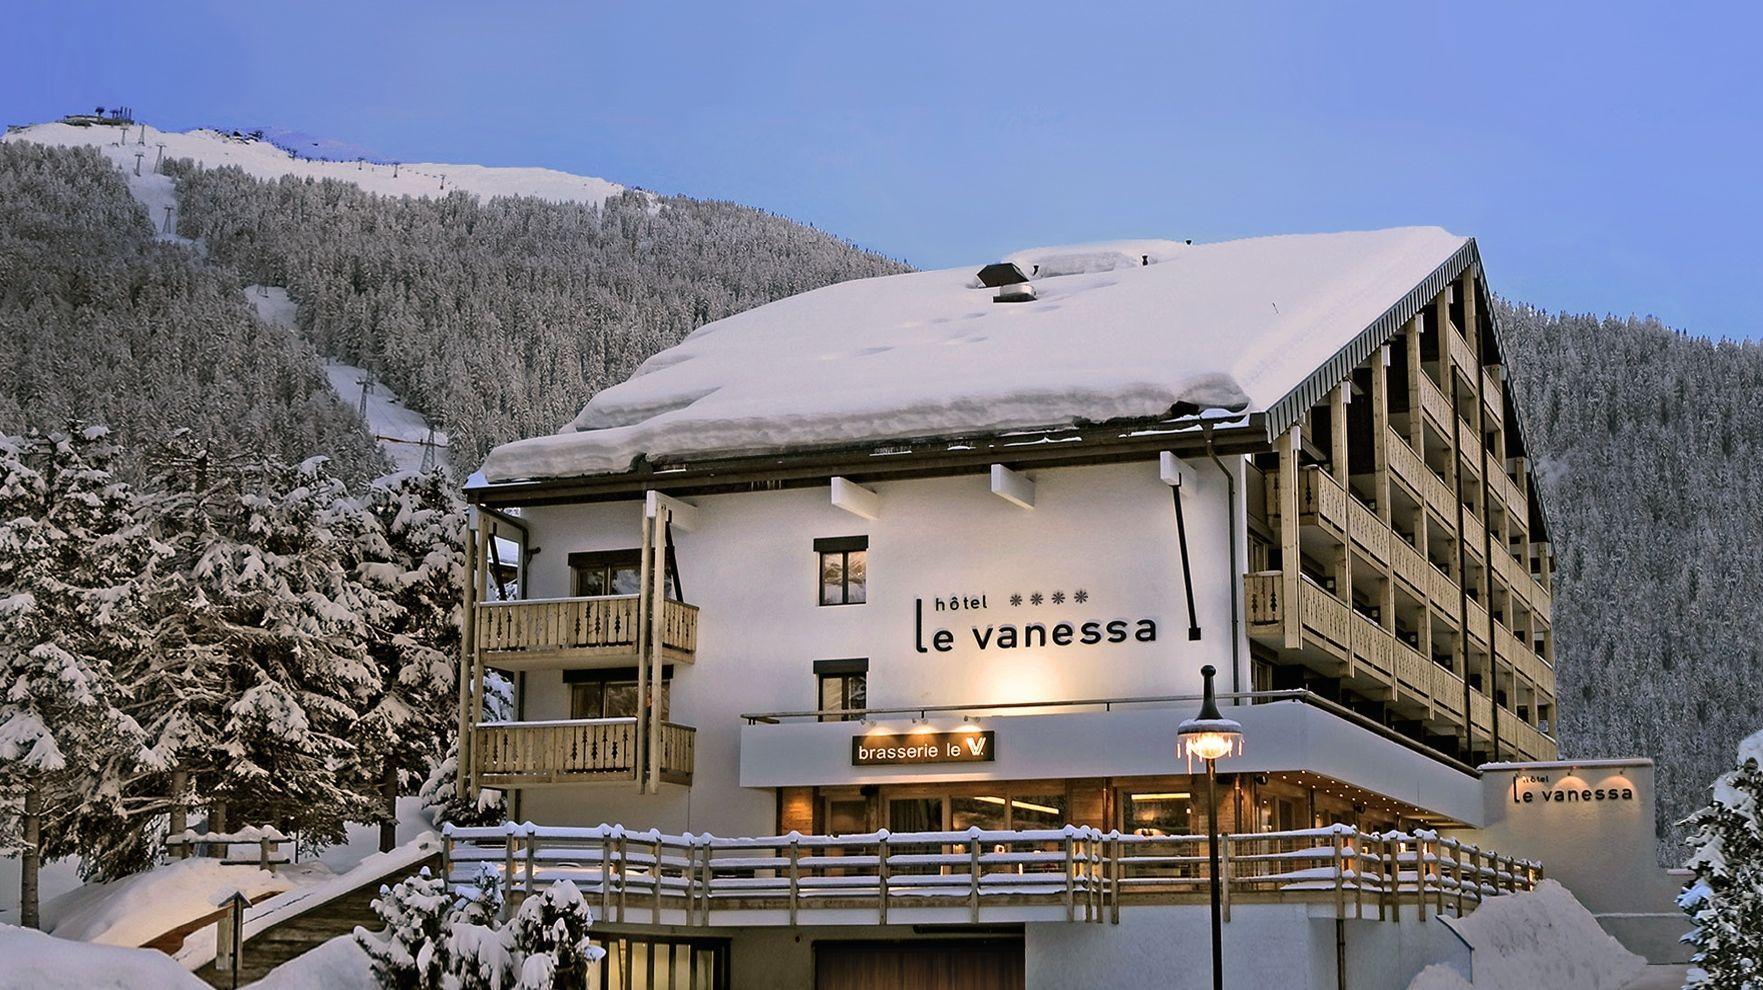 Le vanessa verbier meeting hotels switzerland tourism